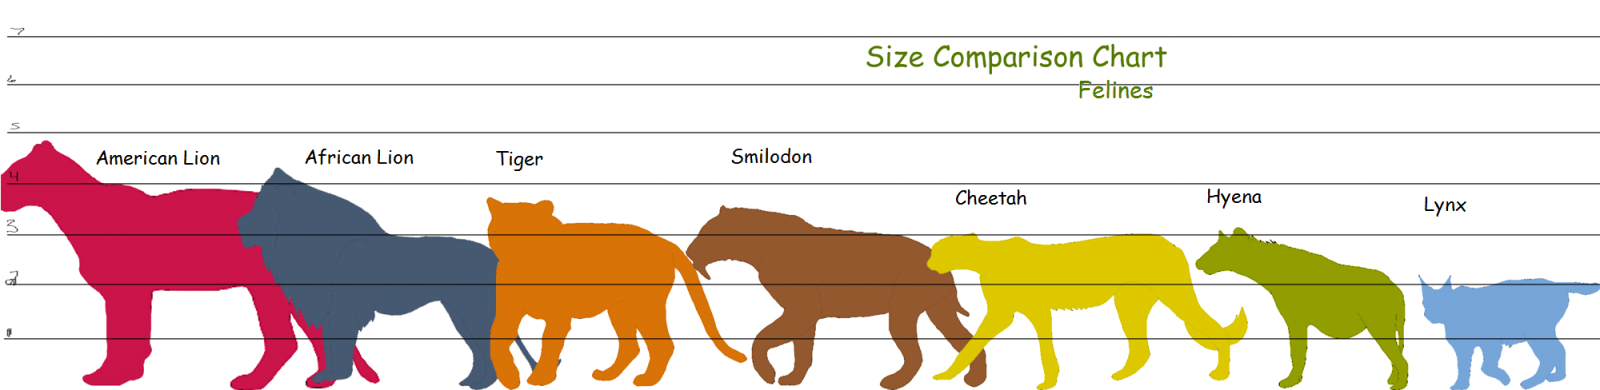 Feline height comparison chart Feline anatomy, African